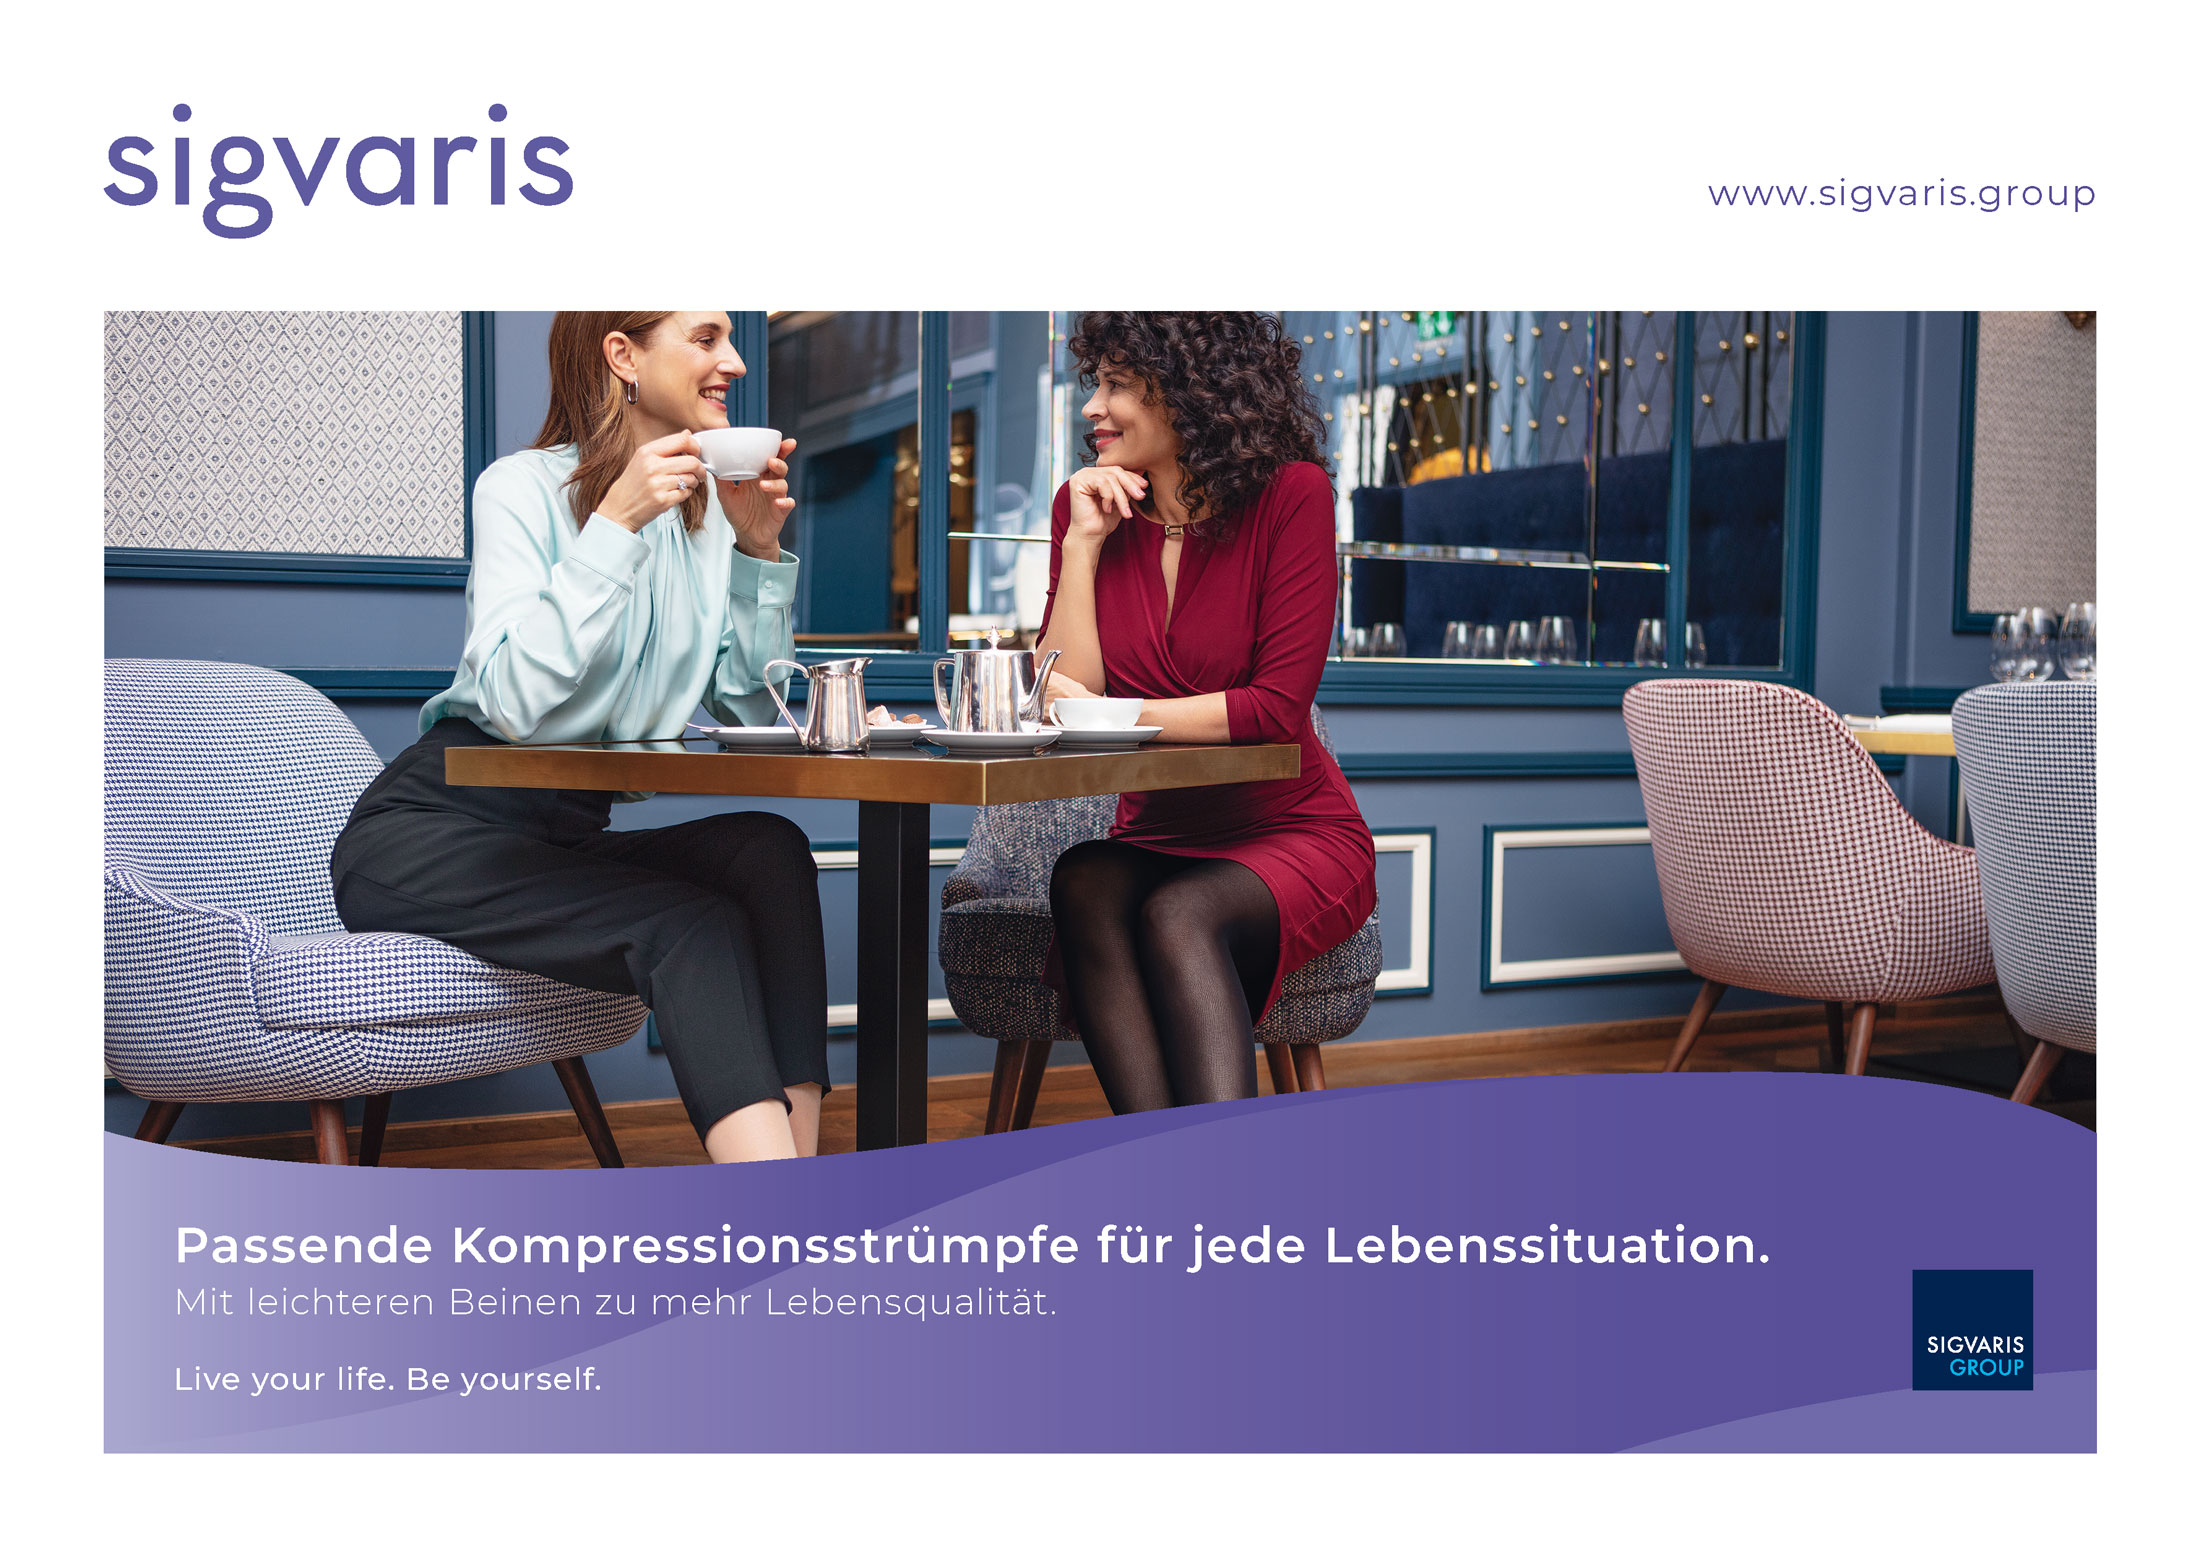 SIGVARIS ist neuer Premium-Partner von odWeb.tv